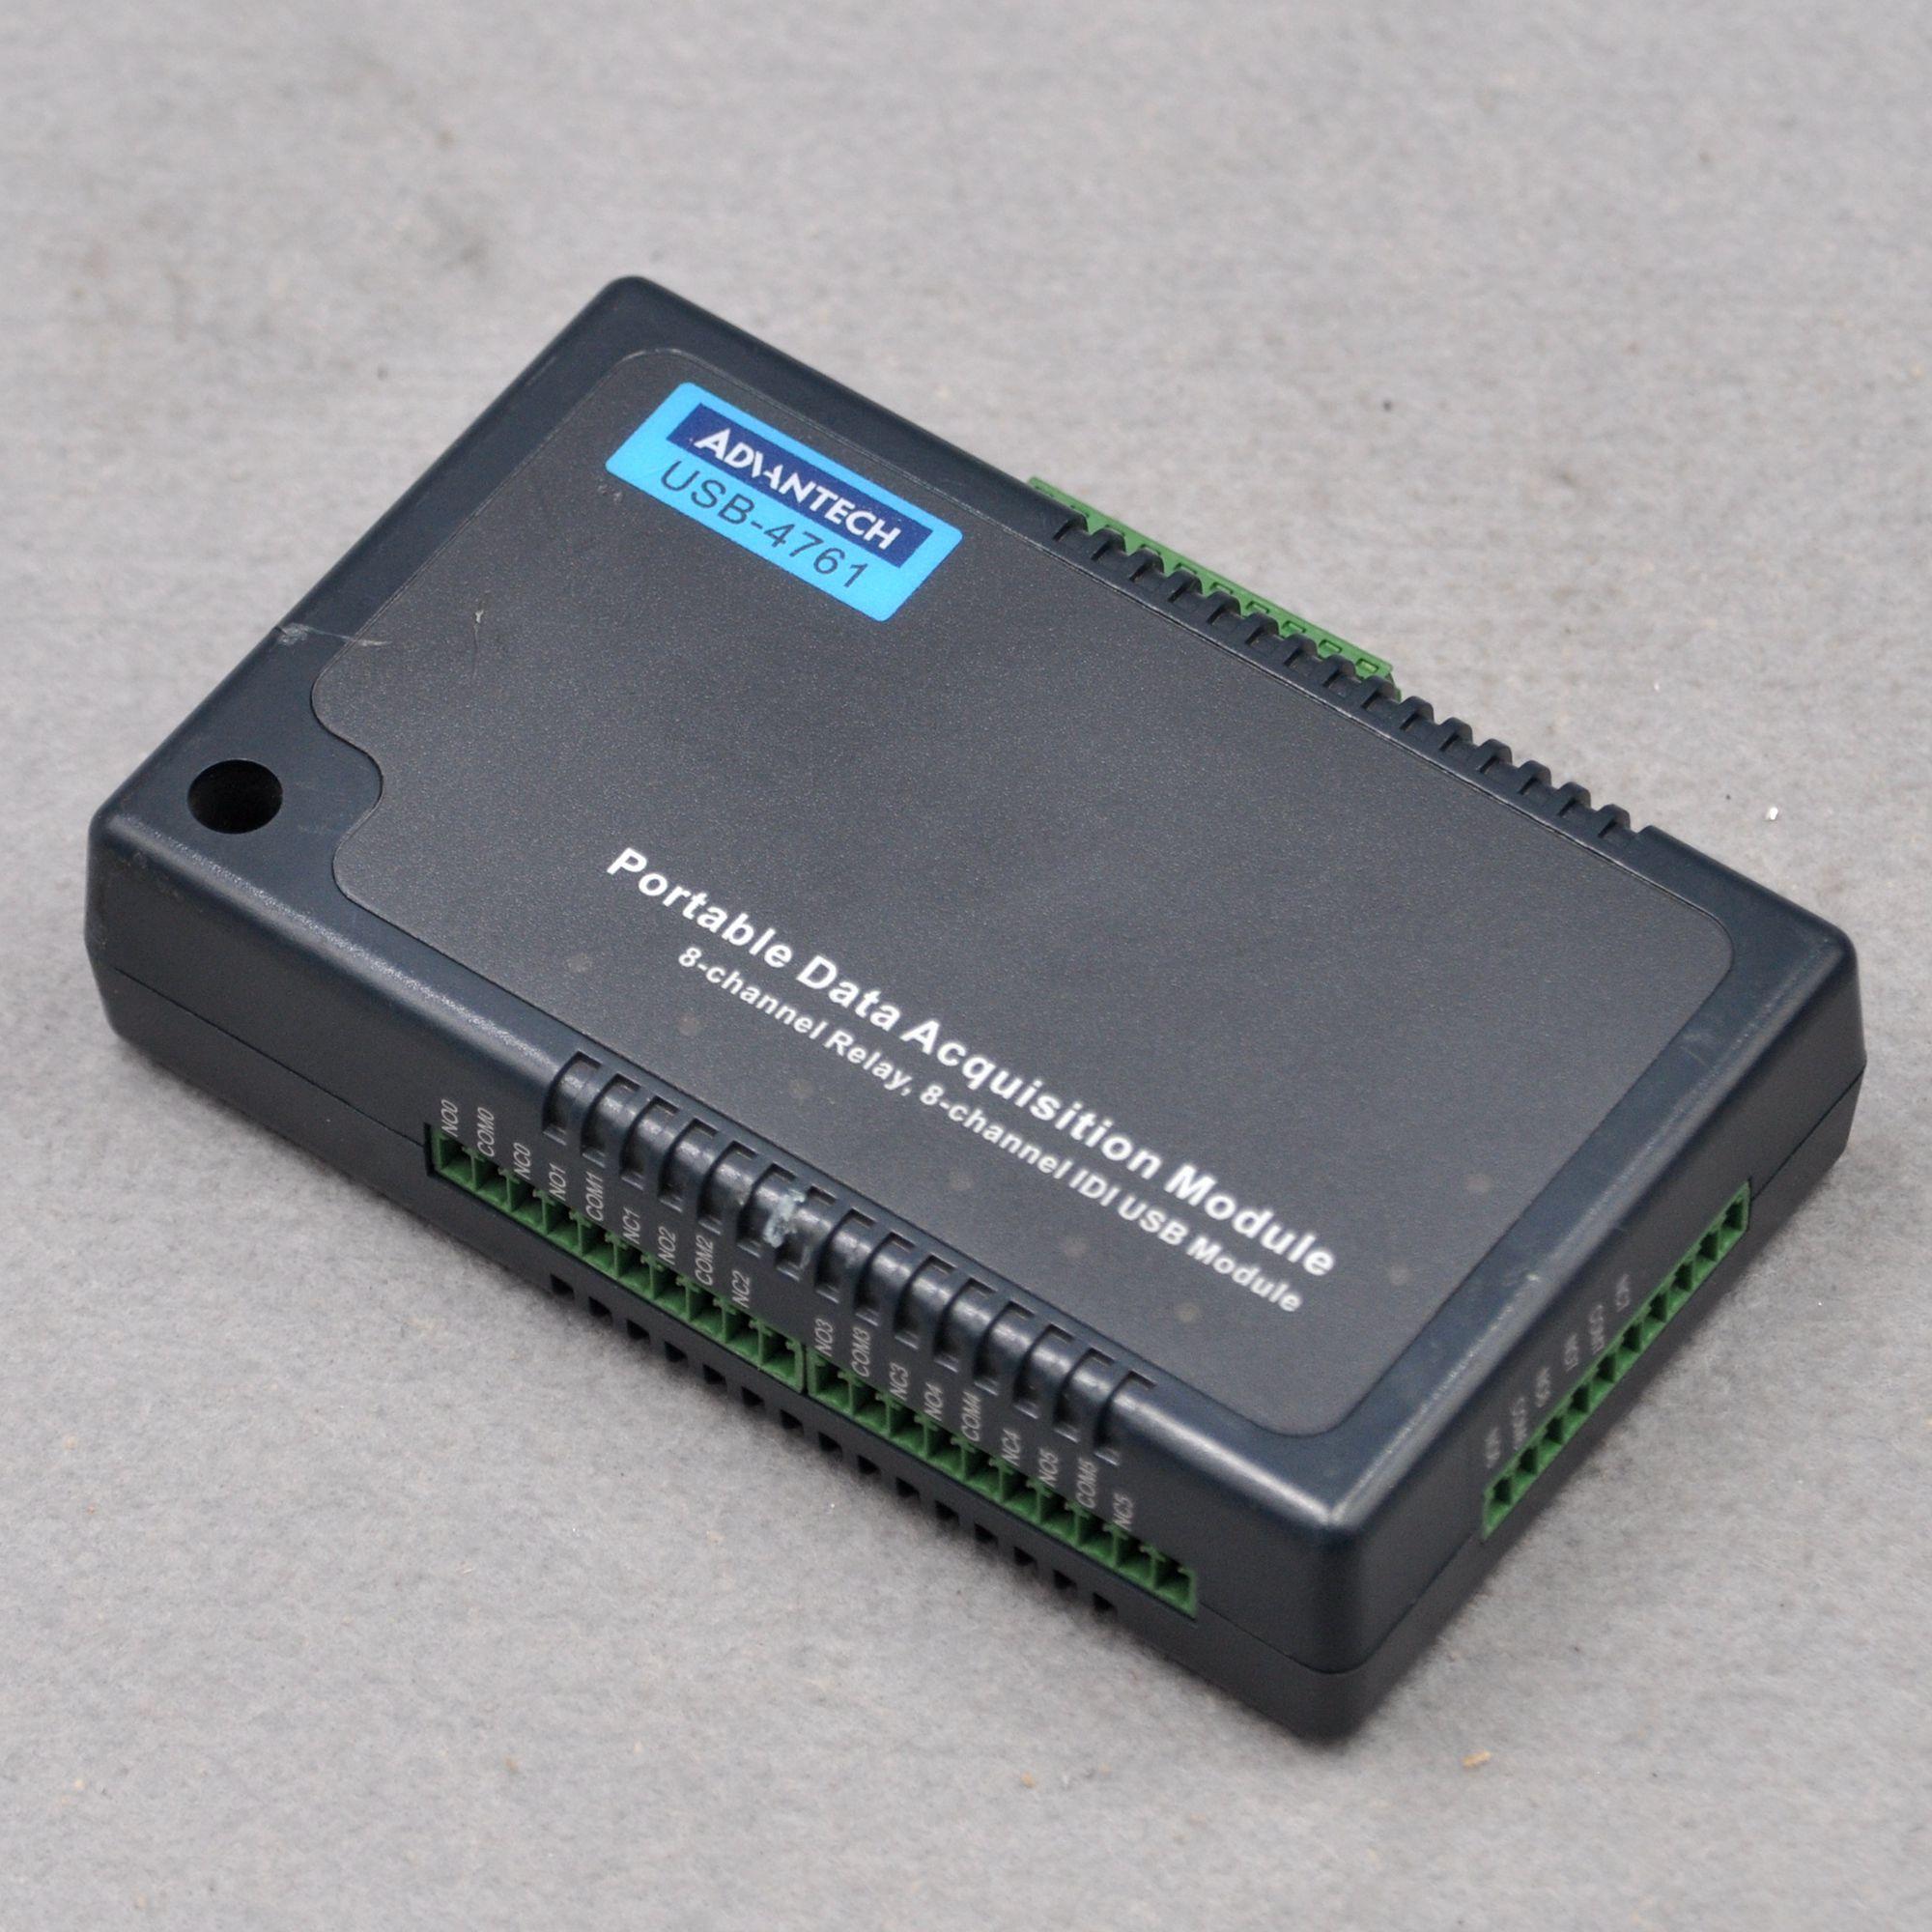 Advantech USB-4761 8-channel relay 8-channel isolated DIUSB USB flash drive module